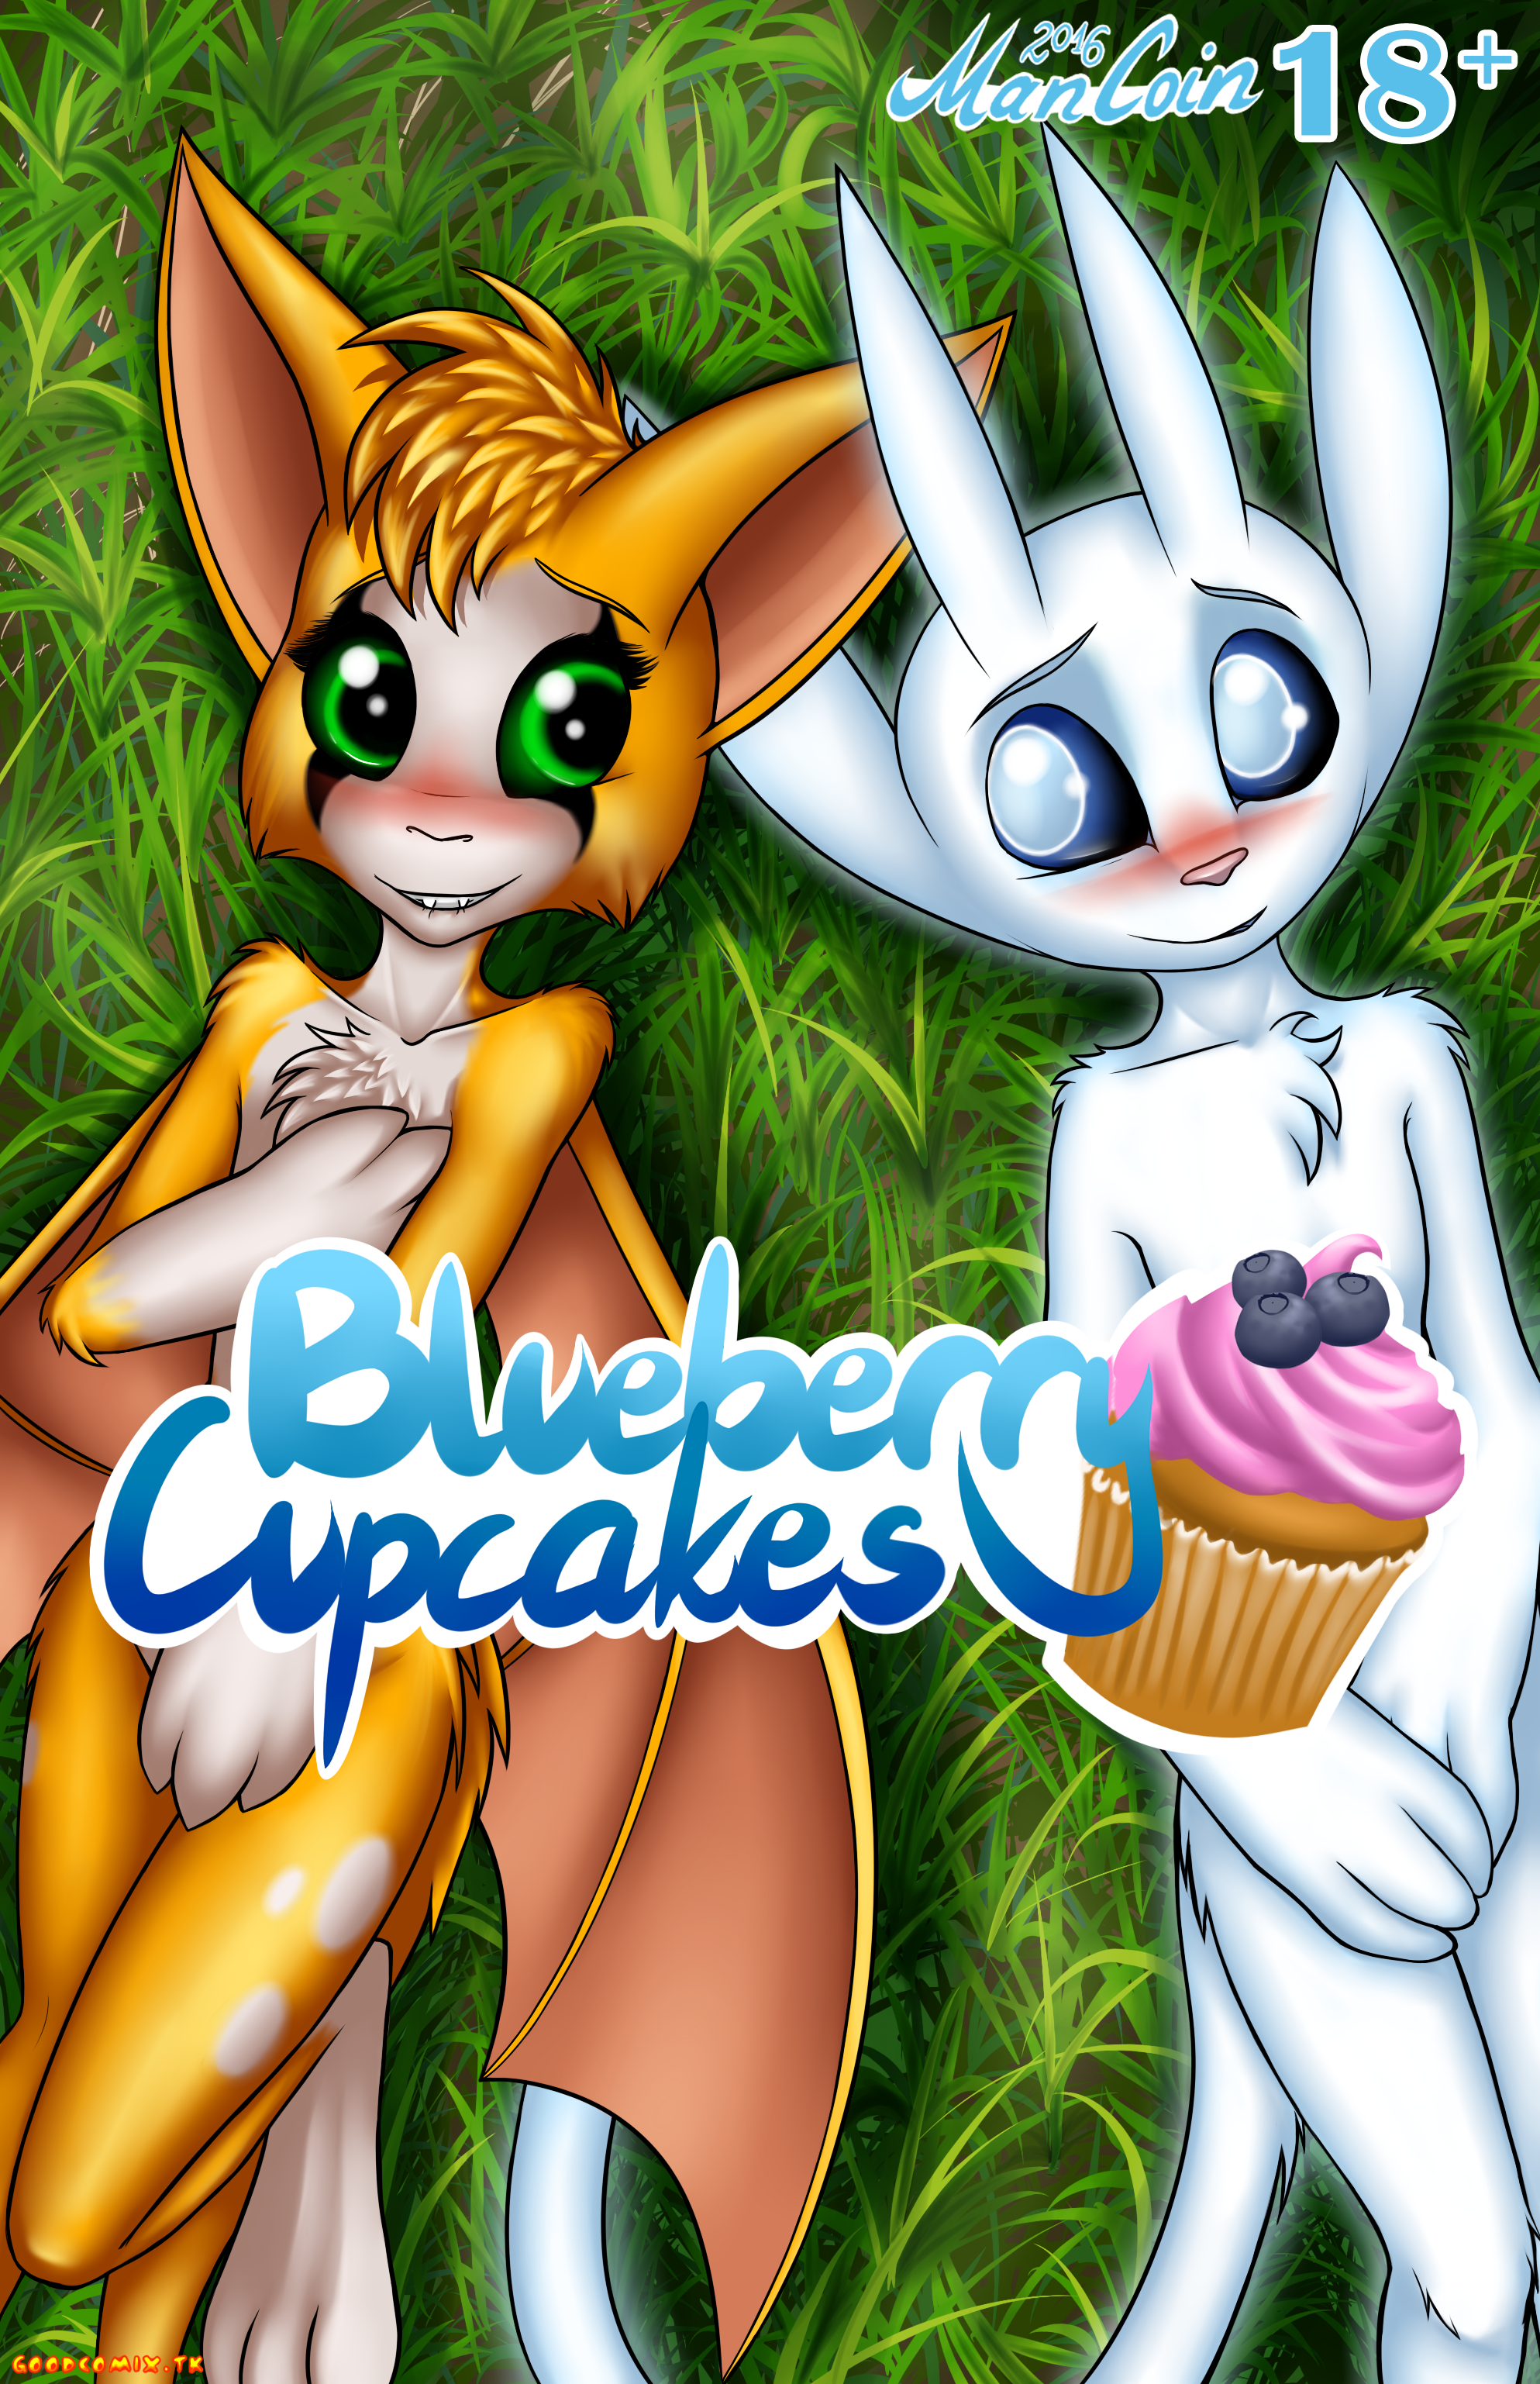 Goodcomix.tk Crossover - [Mancoin] - BlueBerry Cupcakes